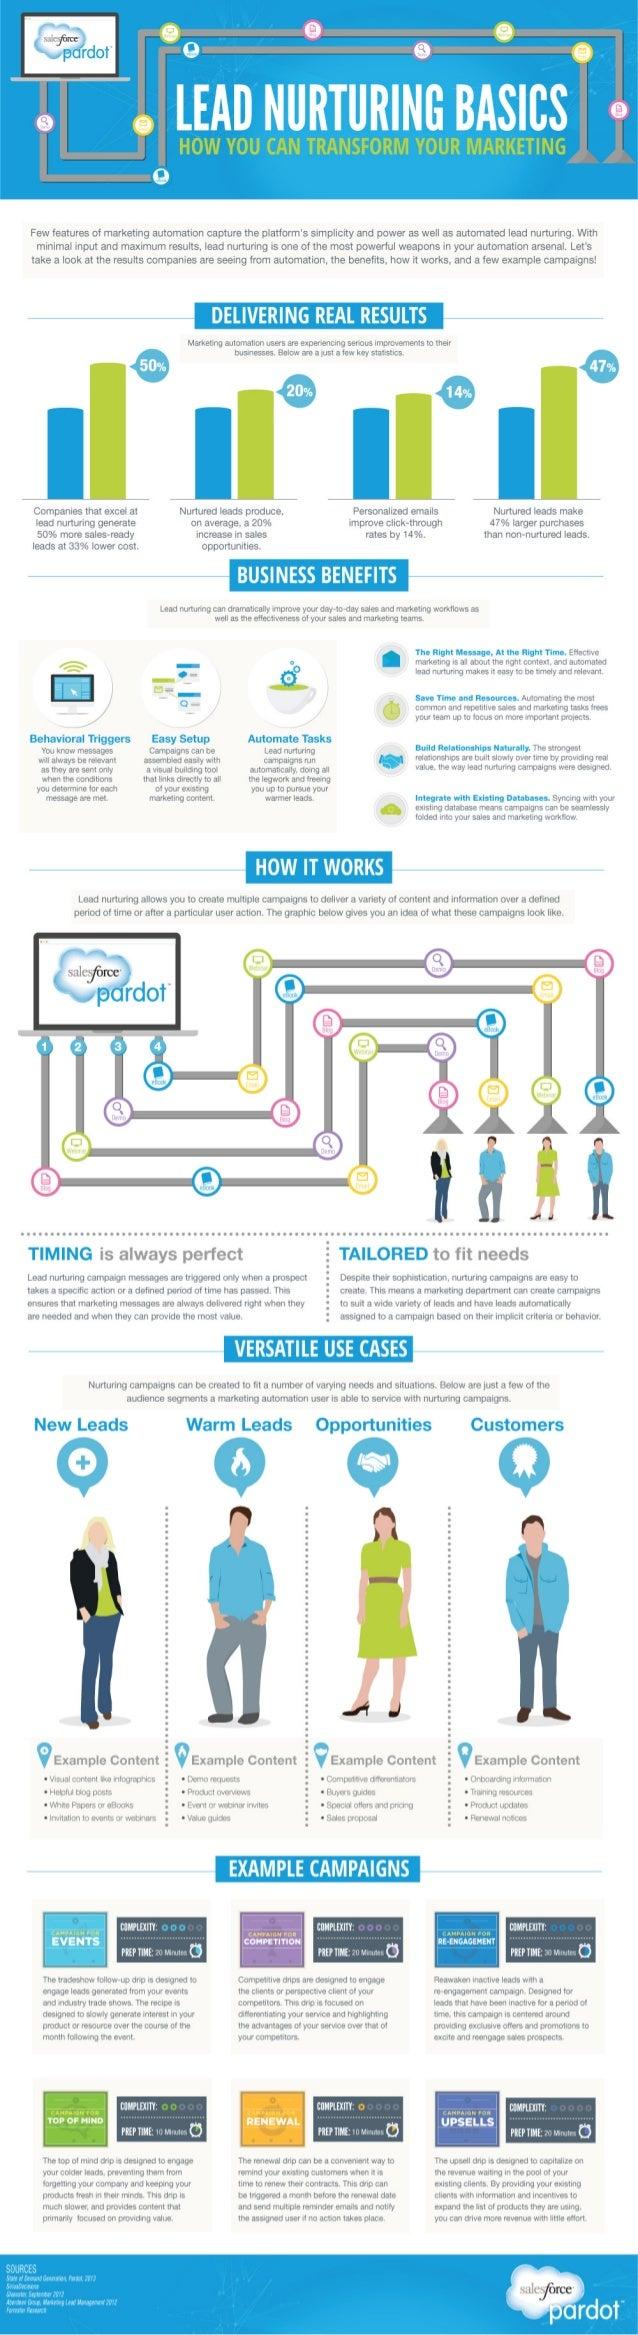 Lead Nurturing Basics [Infographic]